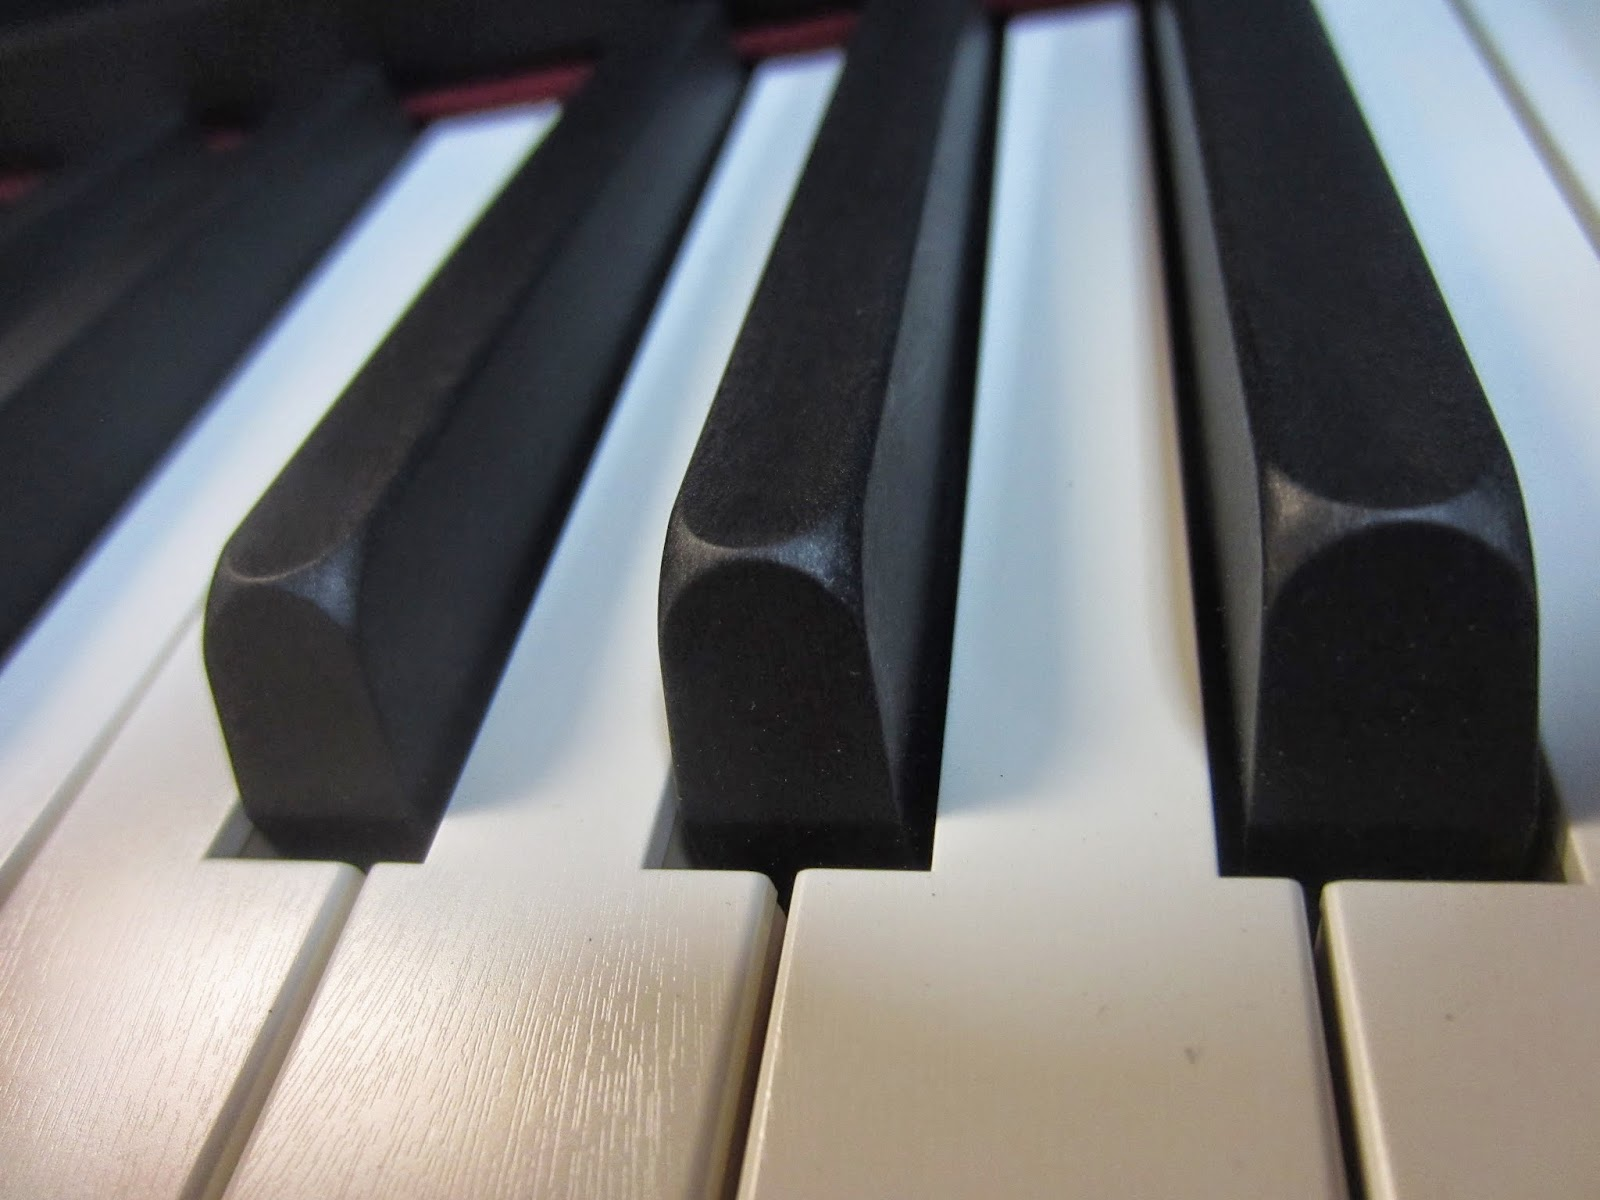 Roland LX15e Concert Keyboard action ivory & ebony keys